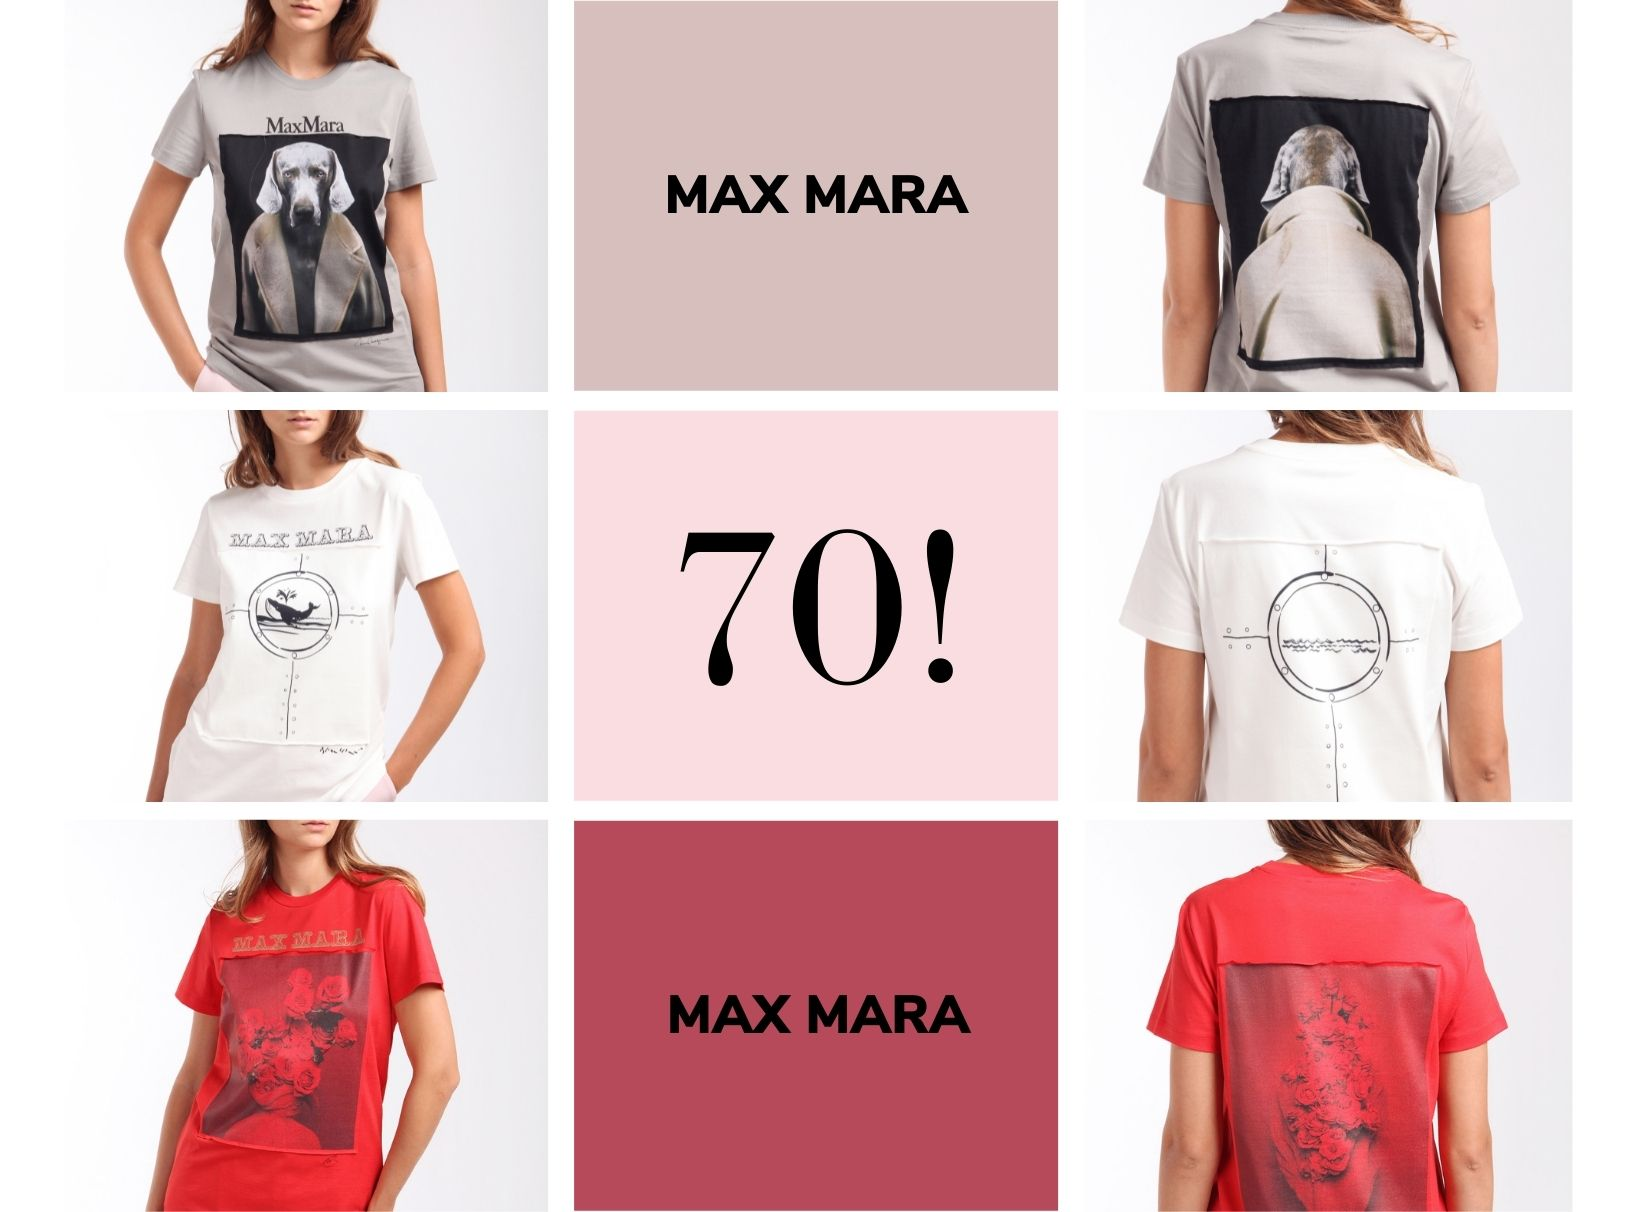 Max Mara 70!